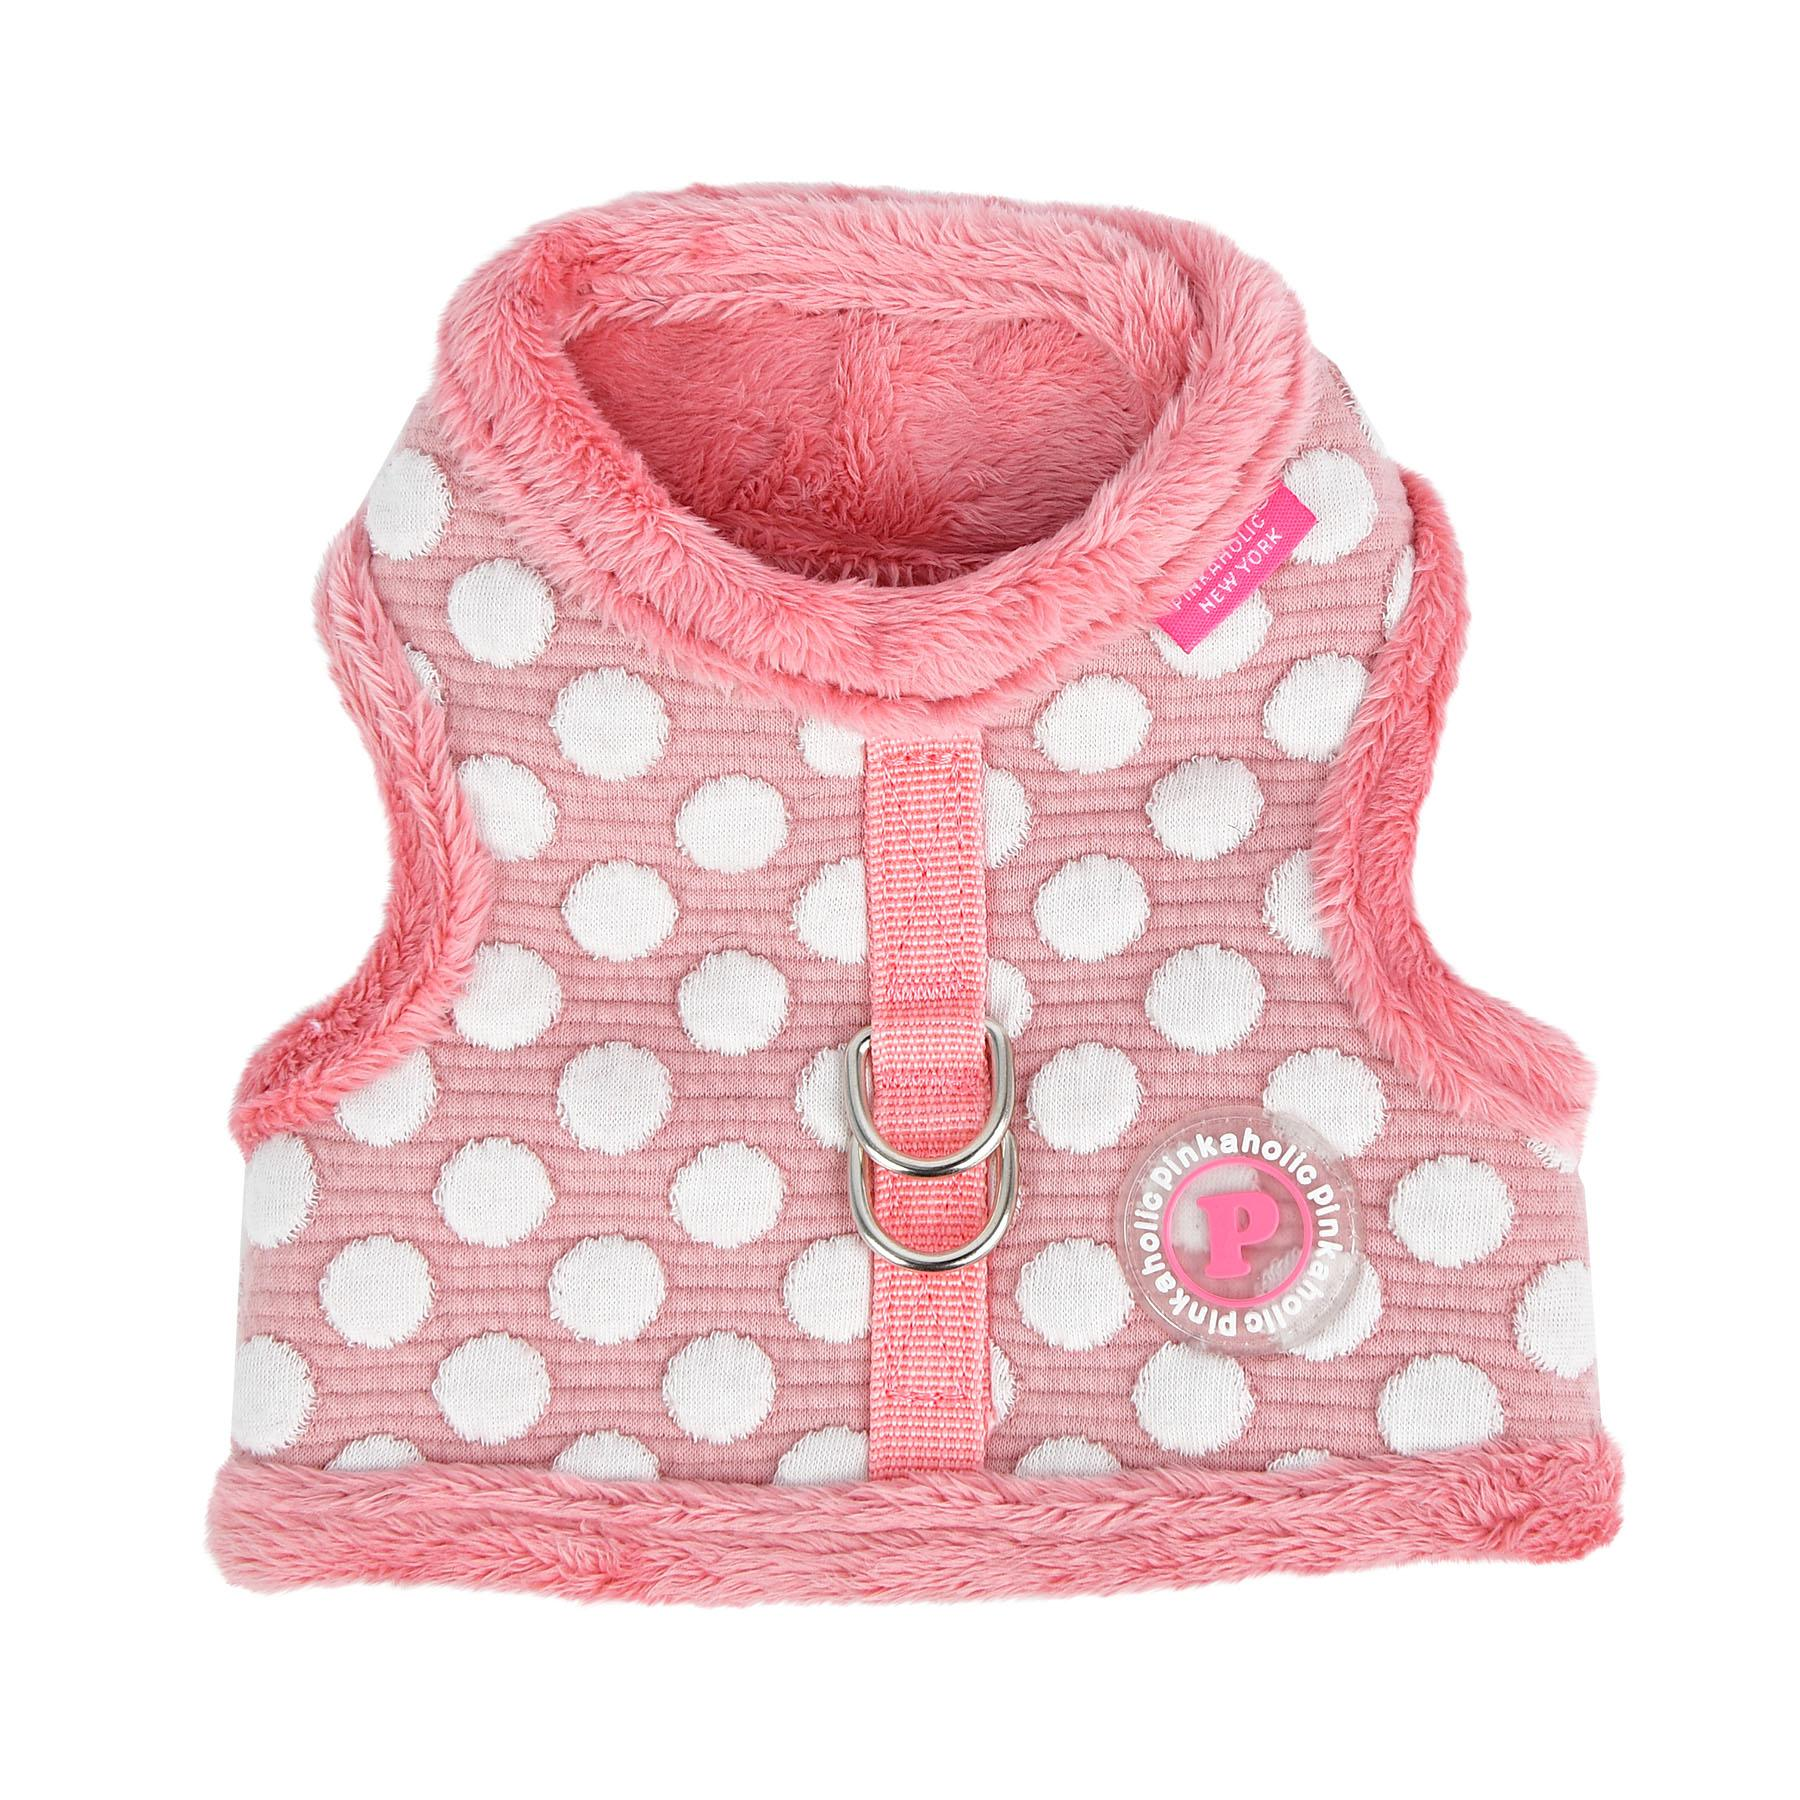 Joceline Jacket Dog Harness By Pinkaholic - Pink